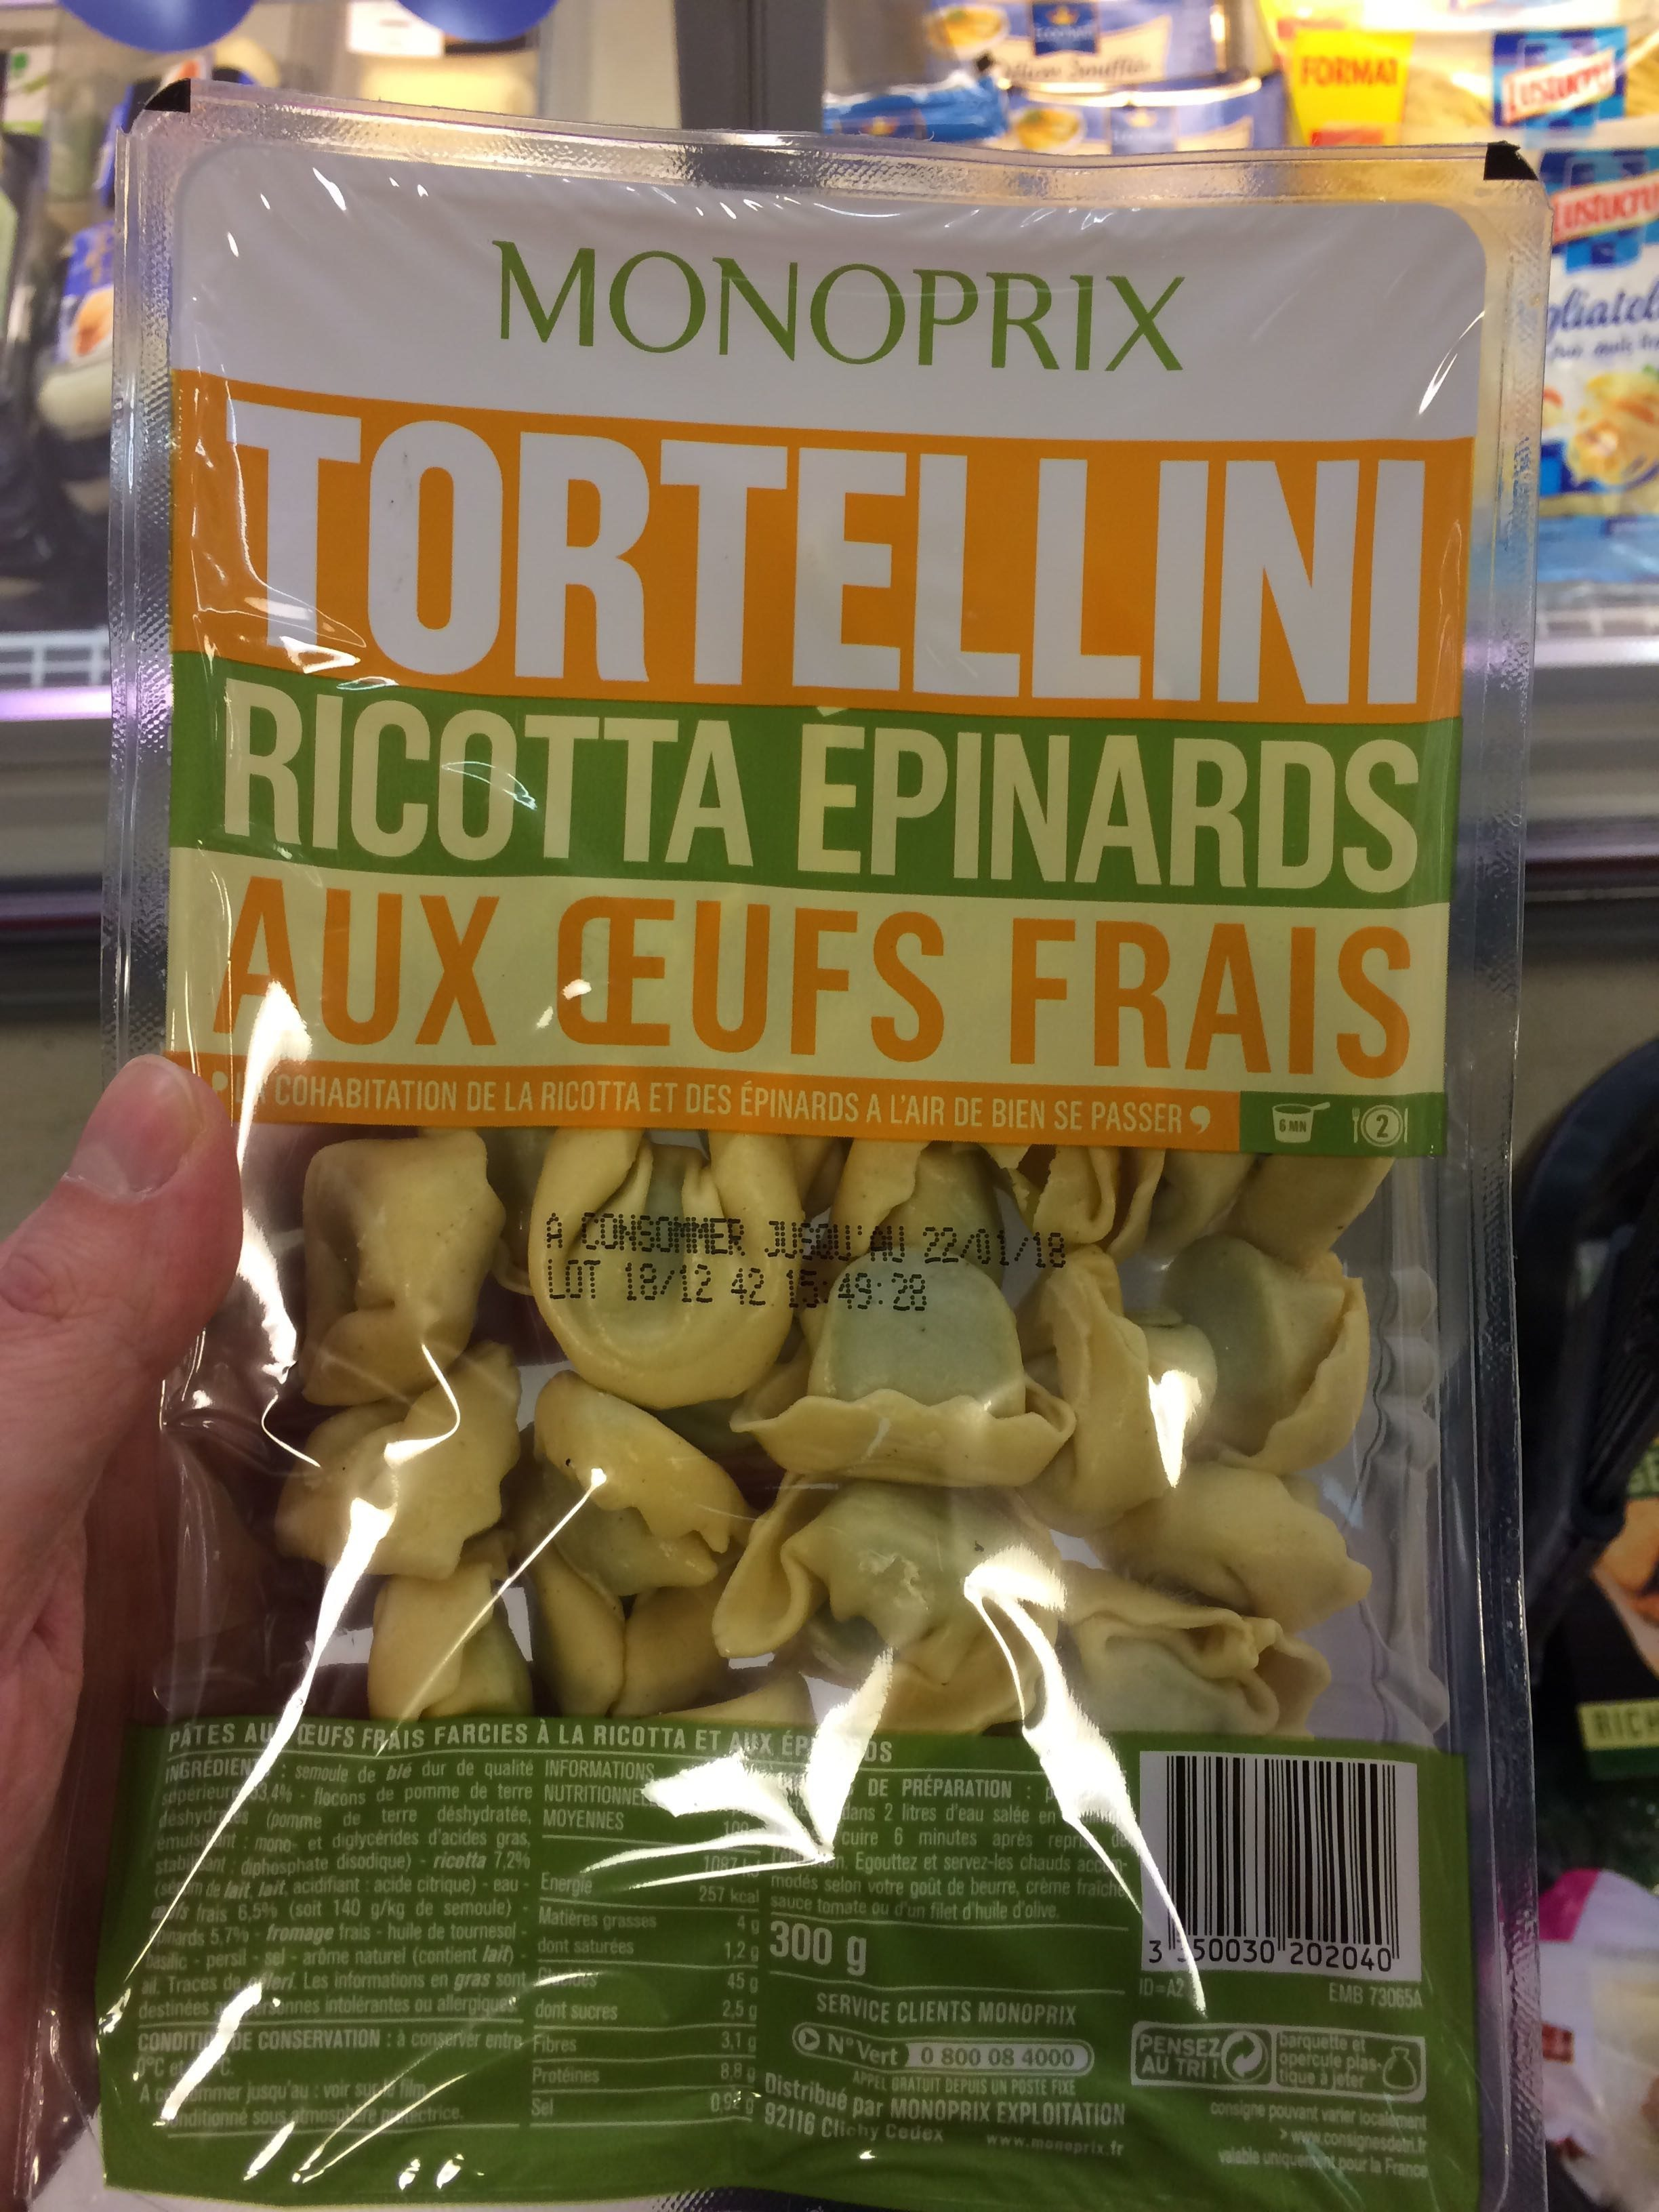 Tortellini ricotta épinard œufs frais - Producto